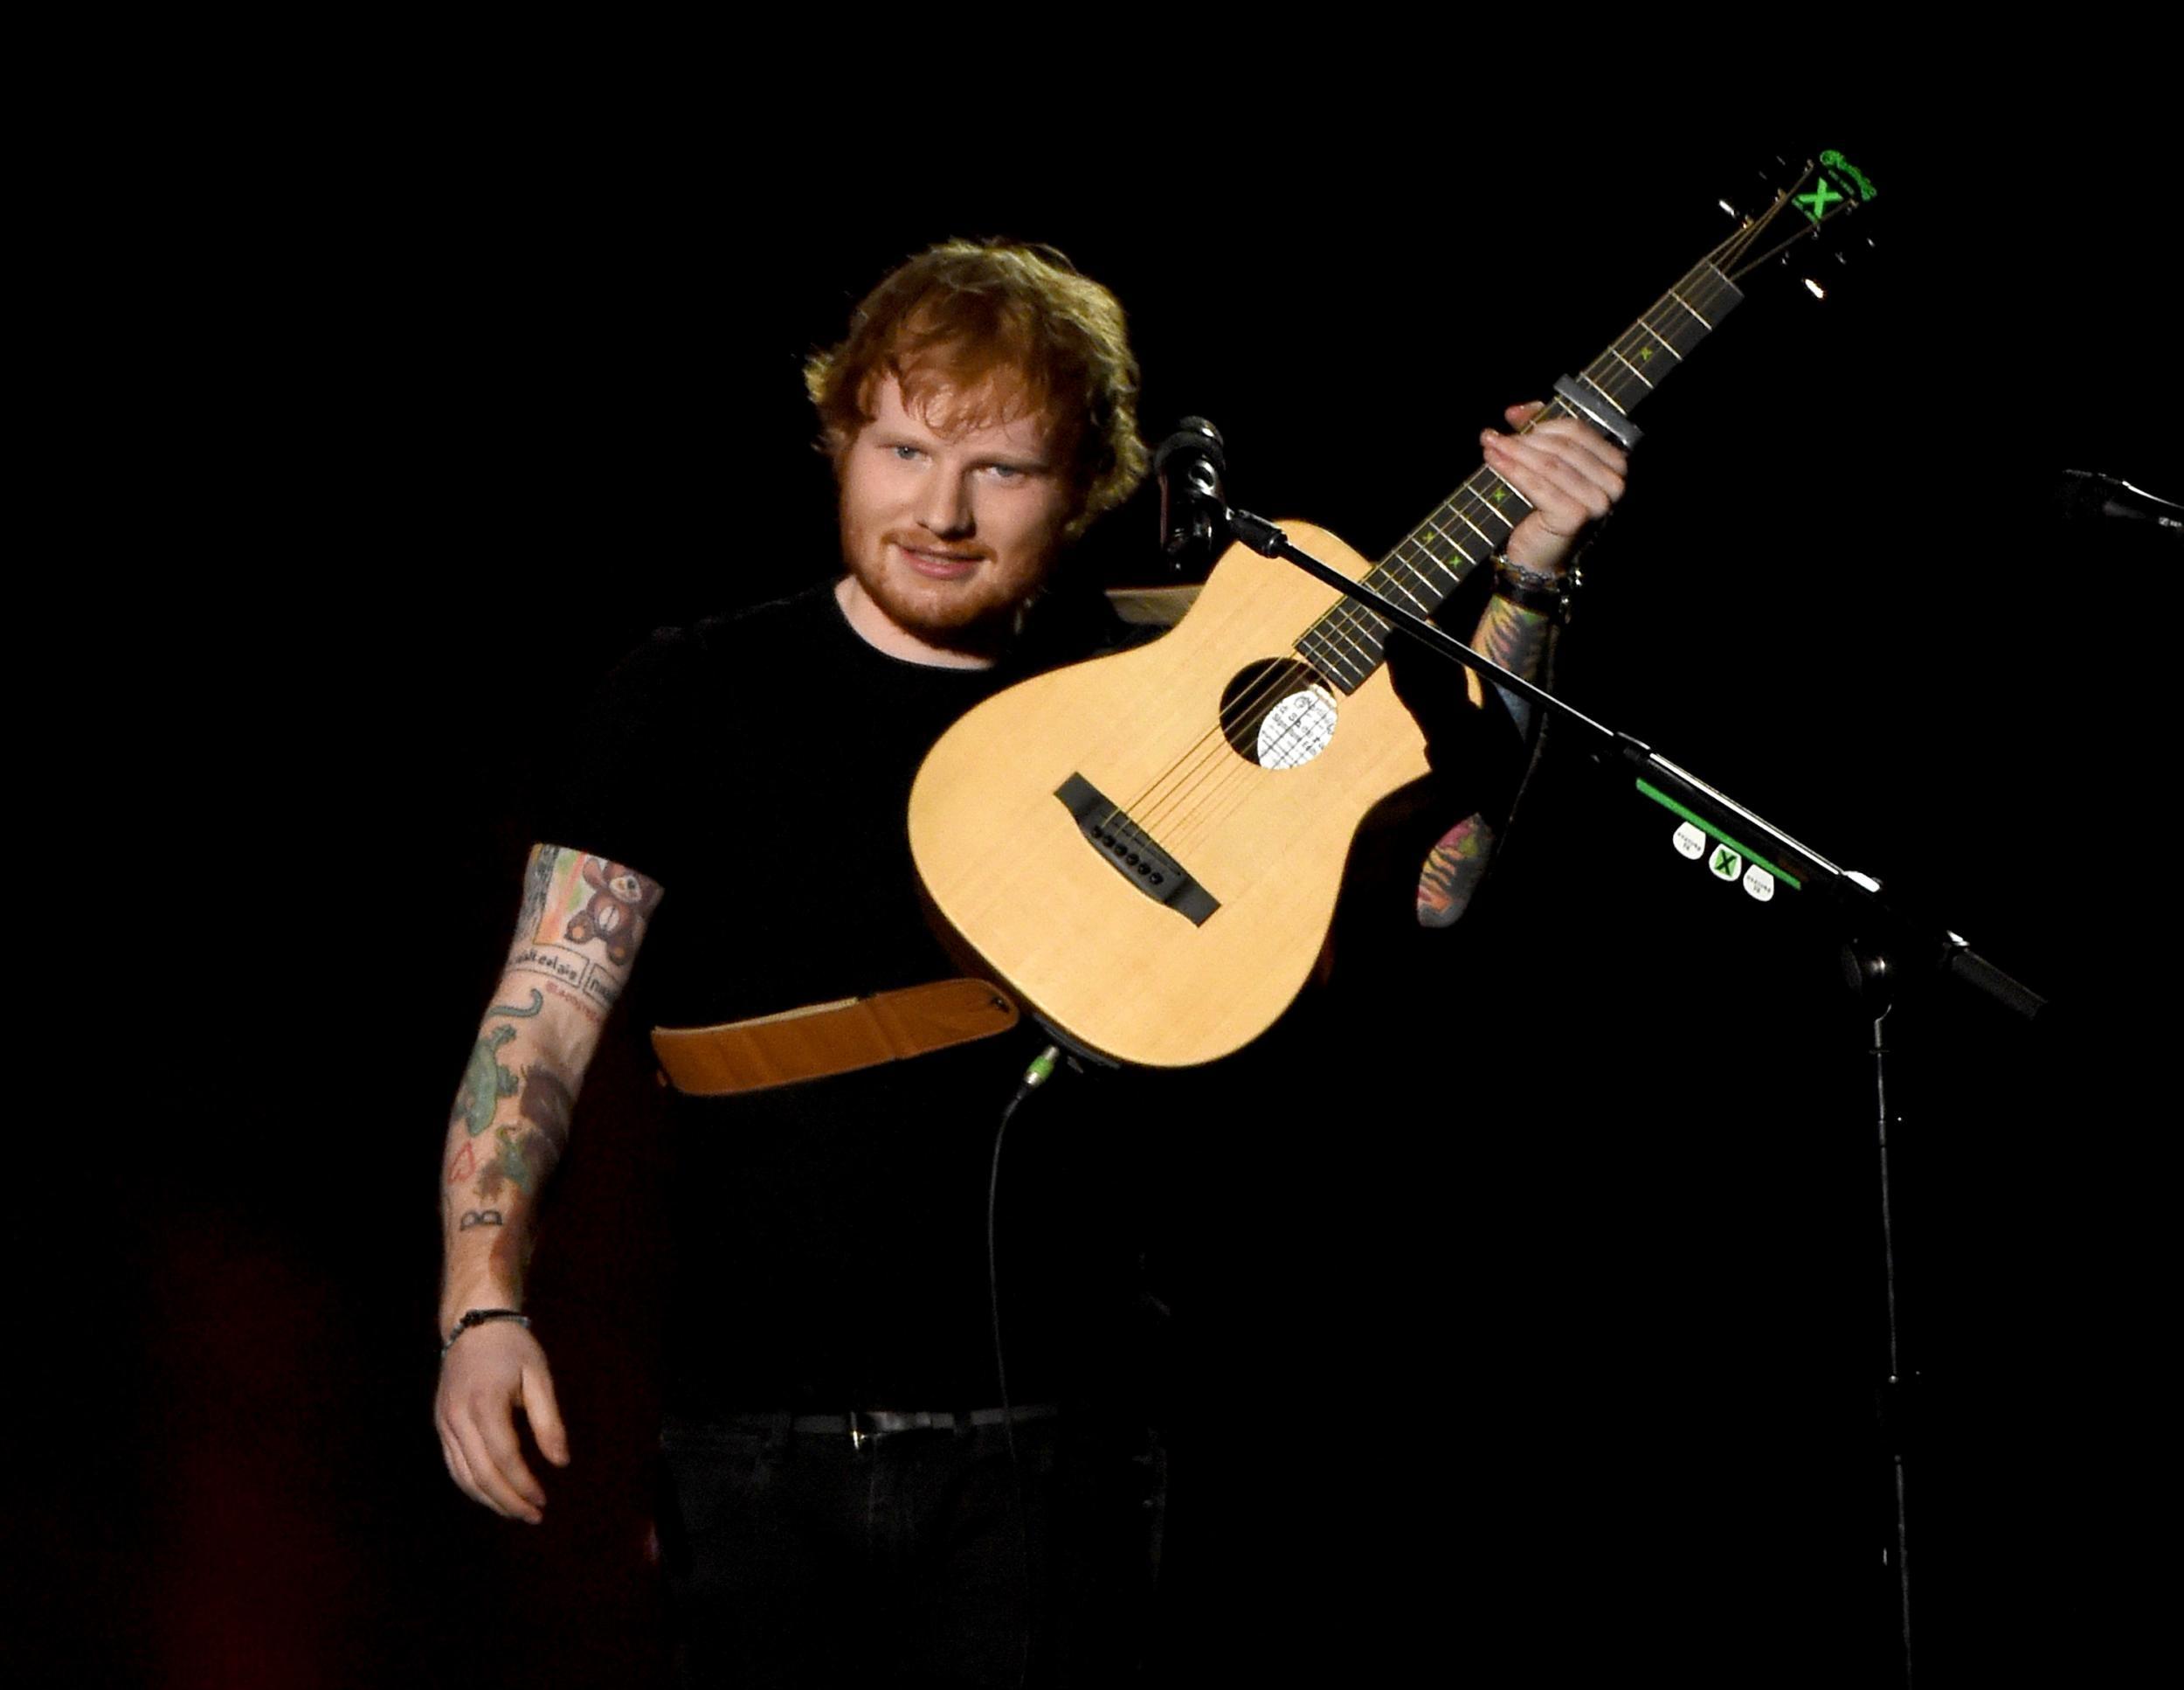 Quitting Twitter helps Ed Sheeran feel healthy